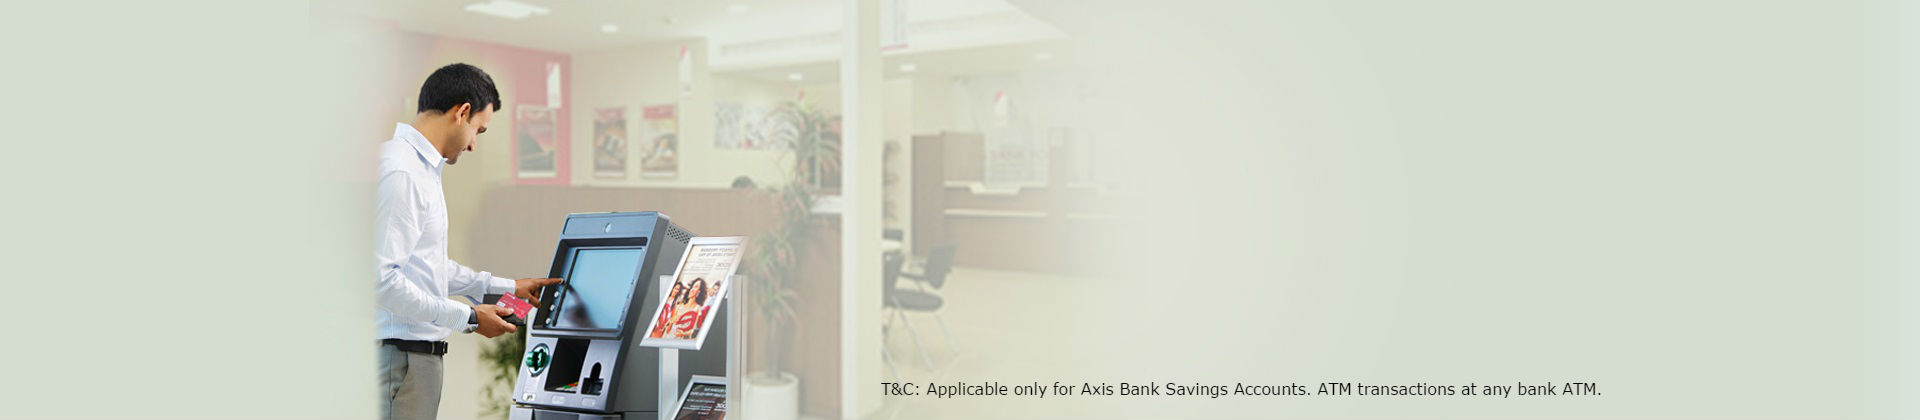 Axis Bank Personal Loan Nri